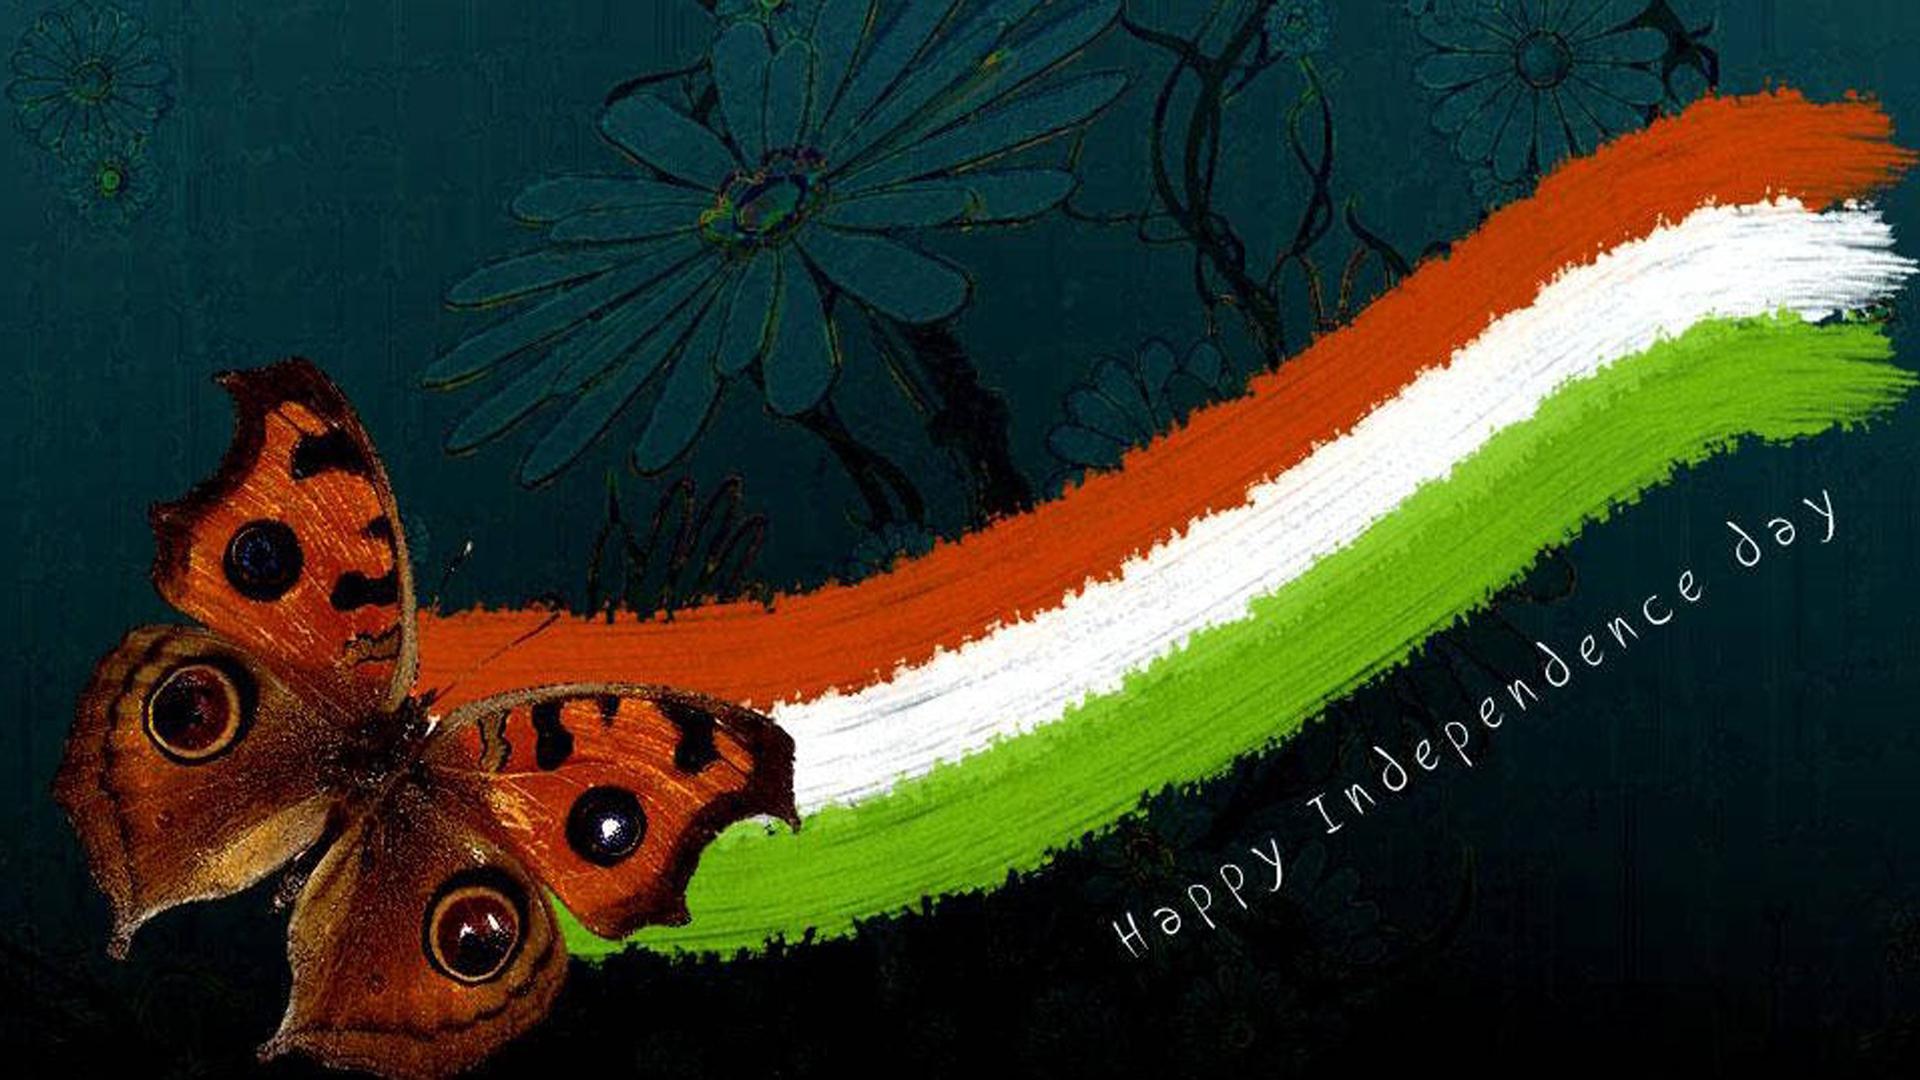 Indian Tiranga 3d Wallpaper India Flag Art For Independence Day Wallpaper Hd